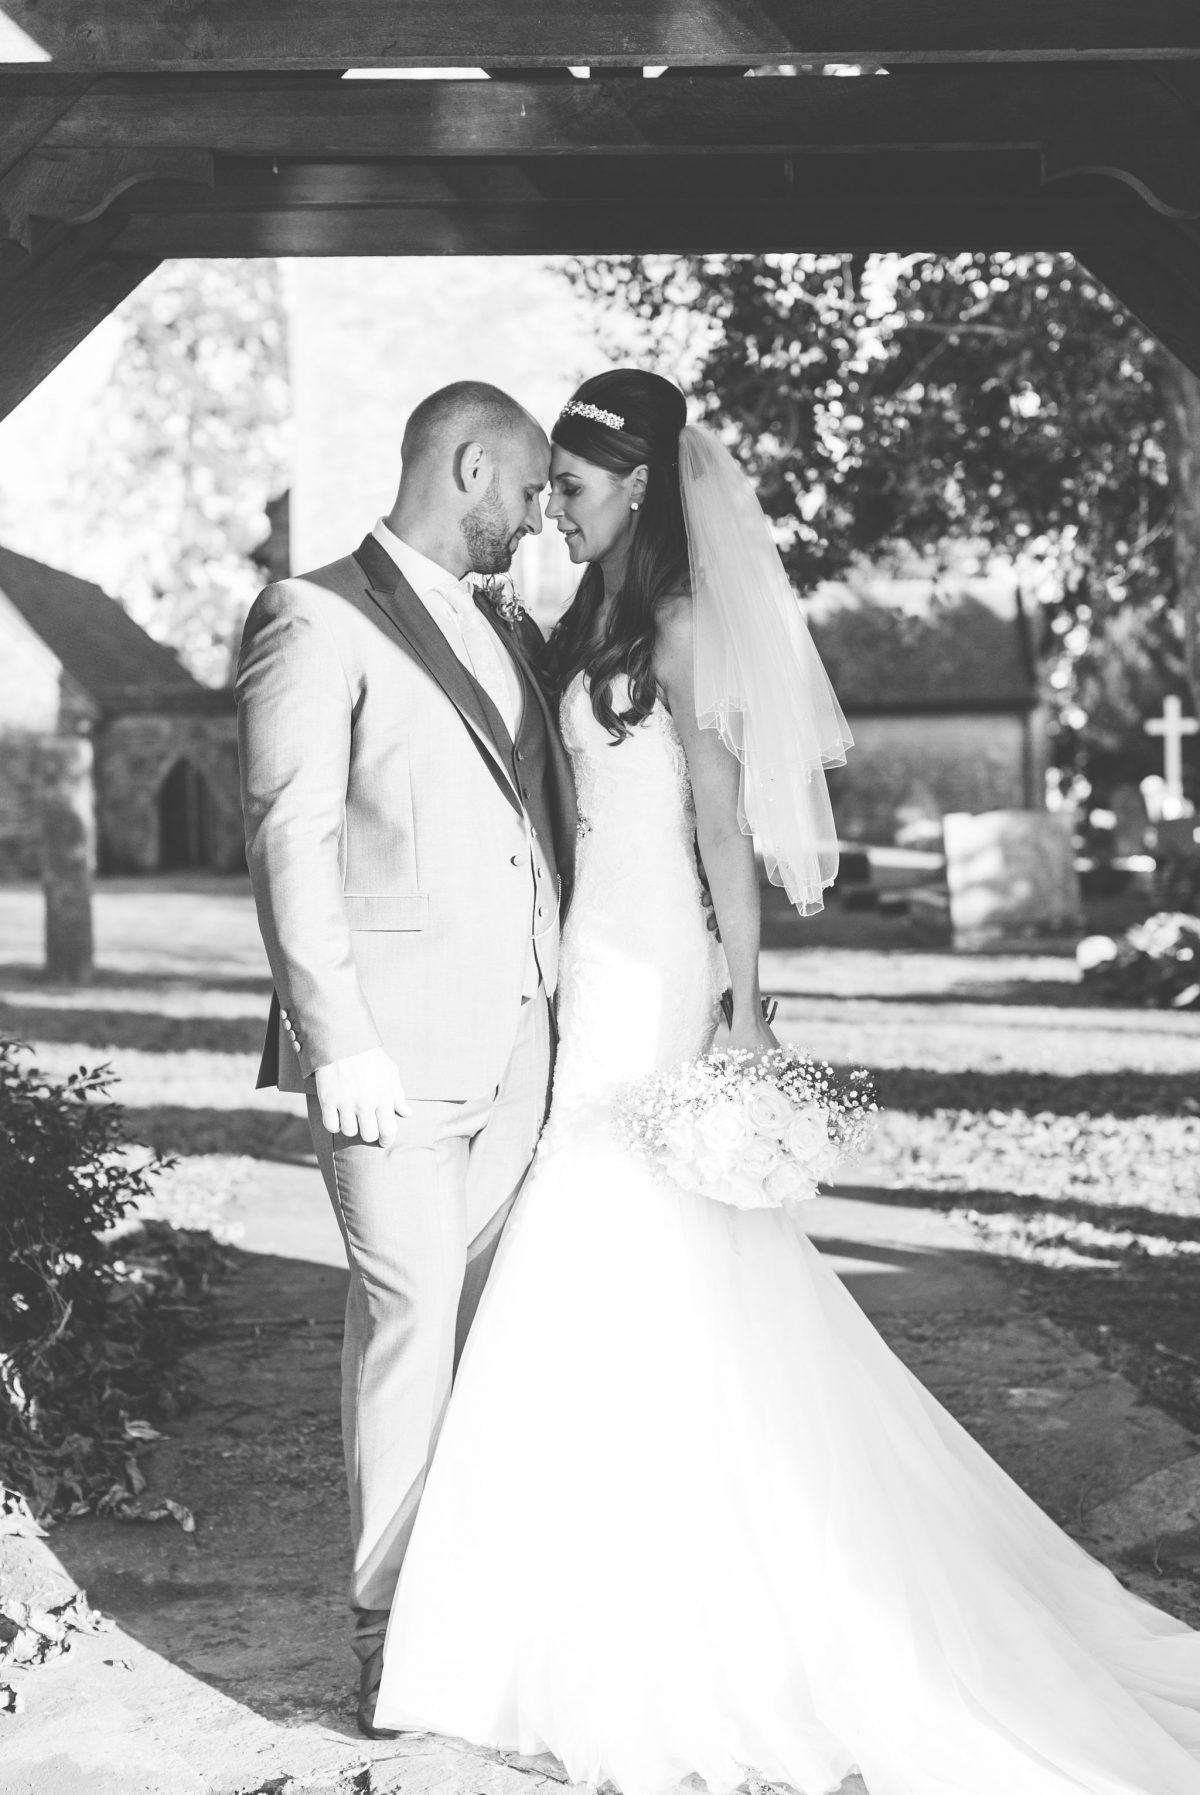 welsh_wedding_photographer_rachel_lambert_photography_decourceys_cardiff_rhiannon_gavin_ 44